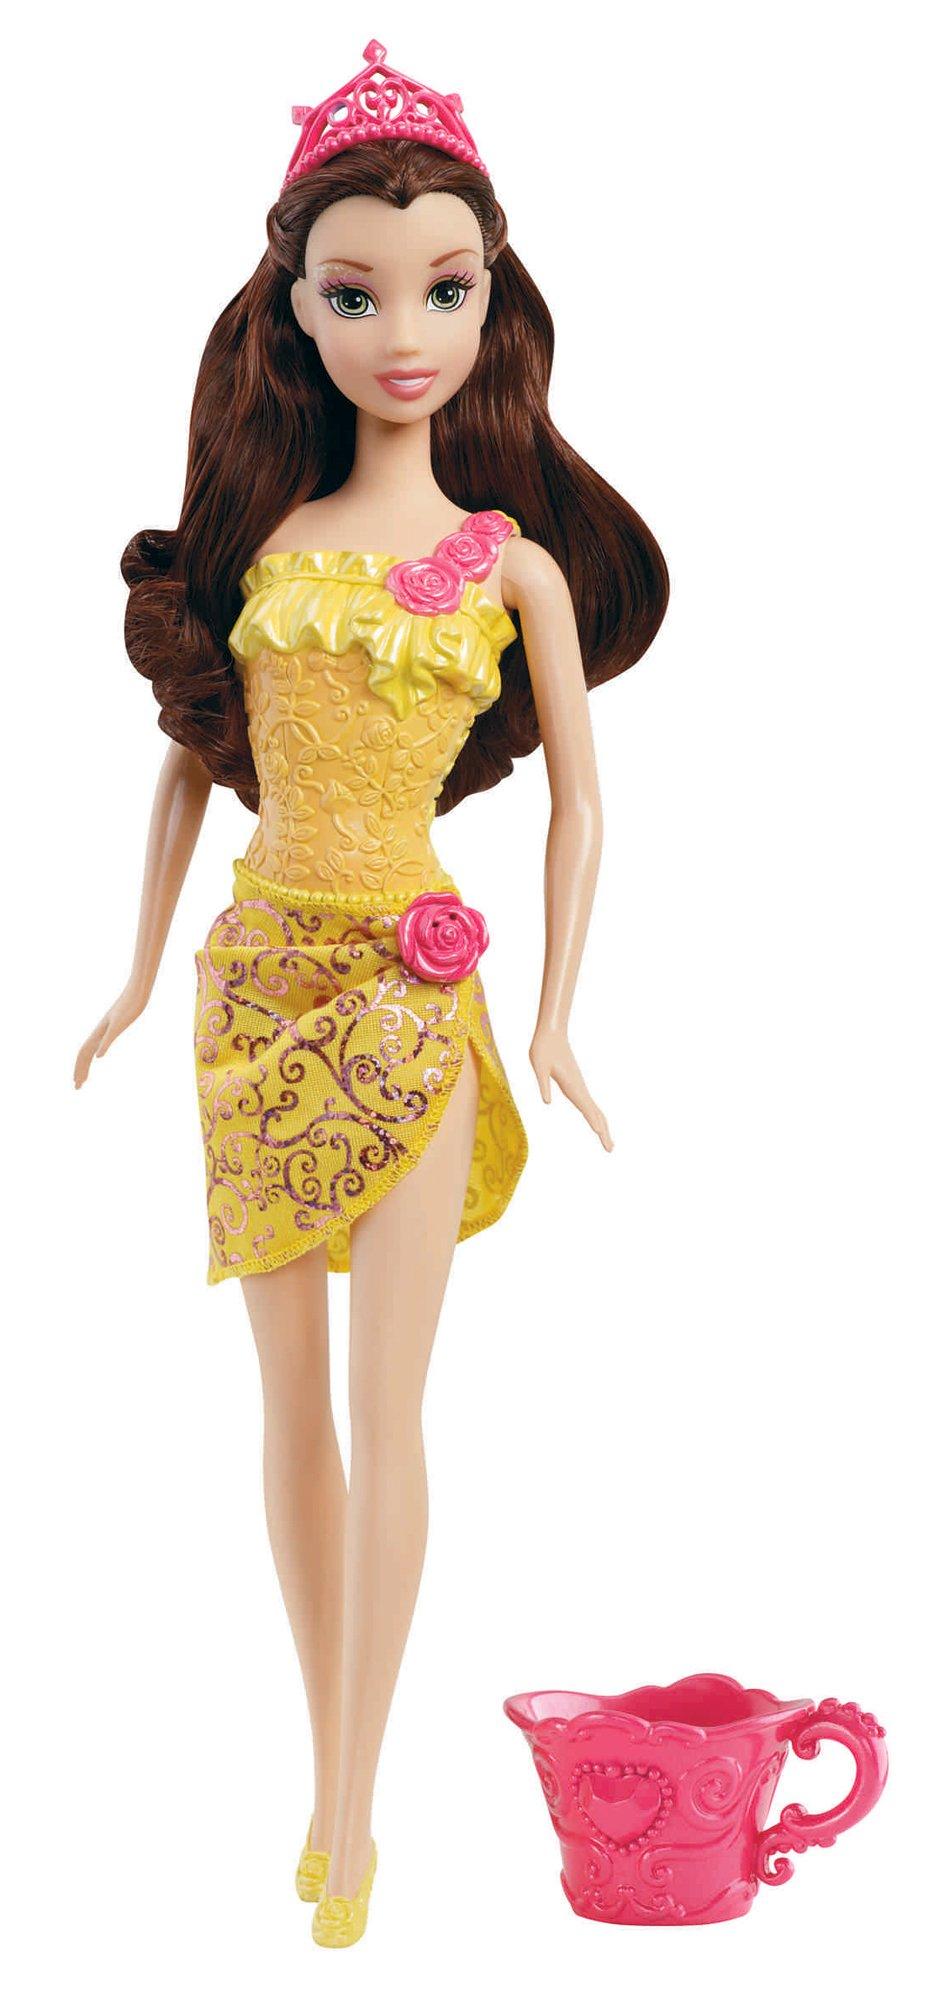 Disney Princess Bath Beauty Belle Doll 2012 Toysplus